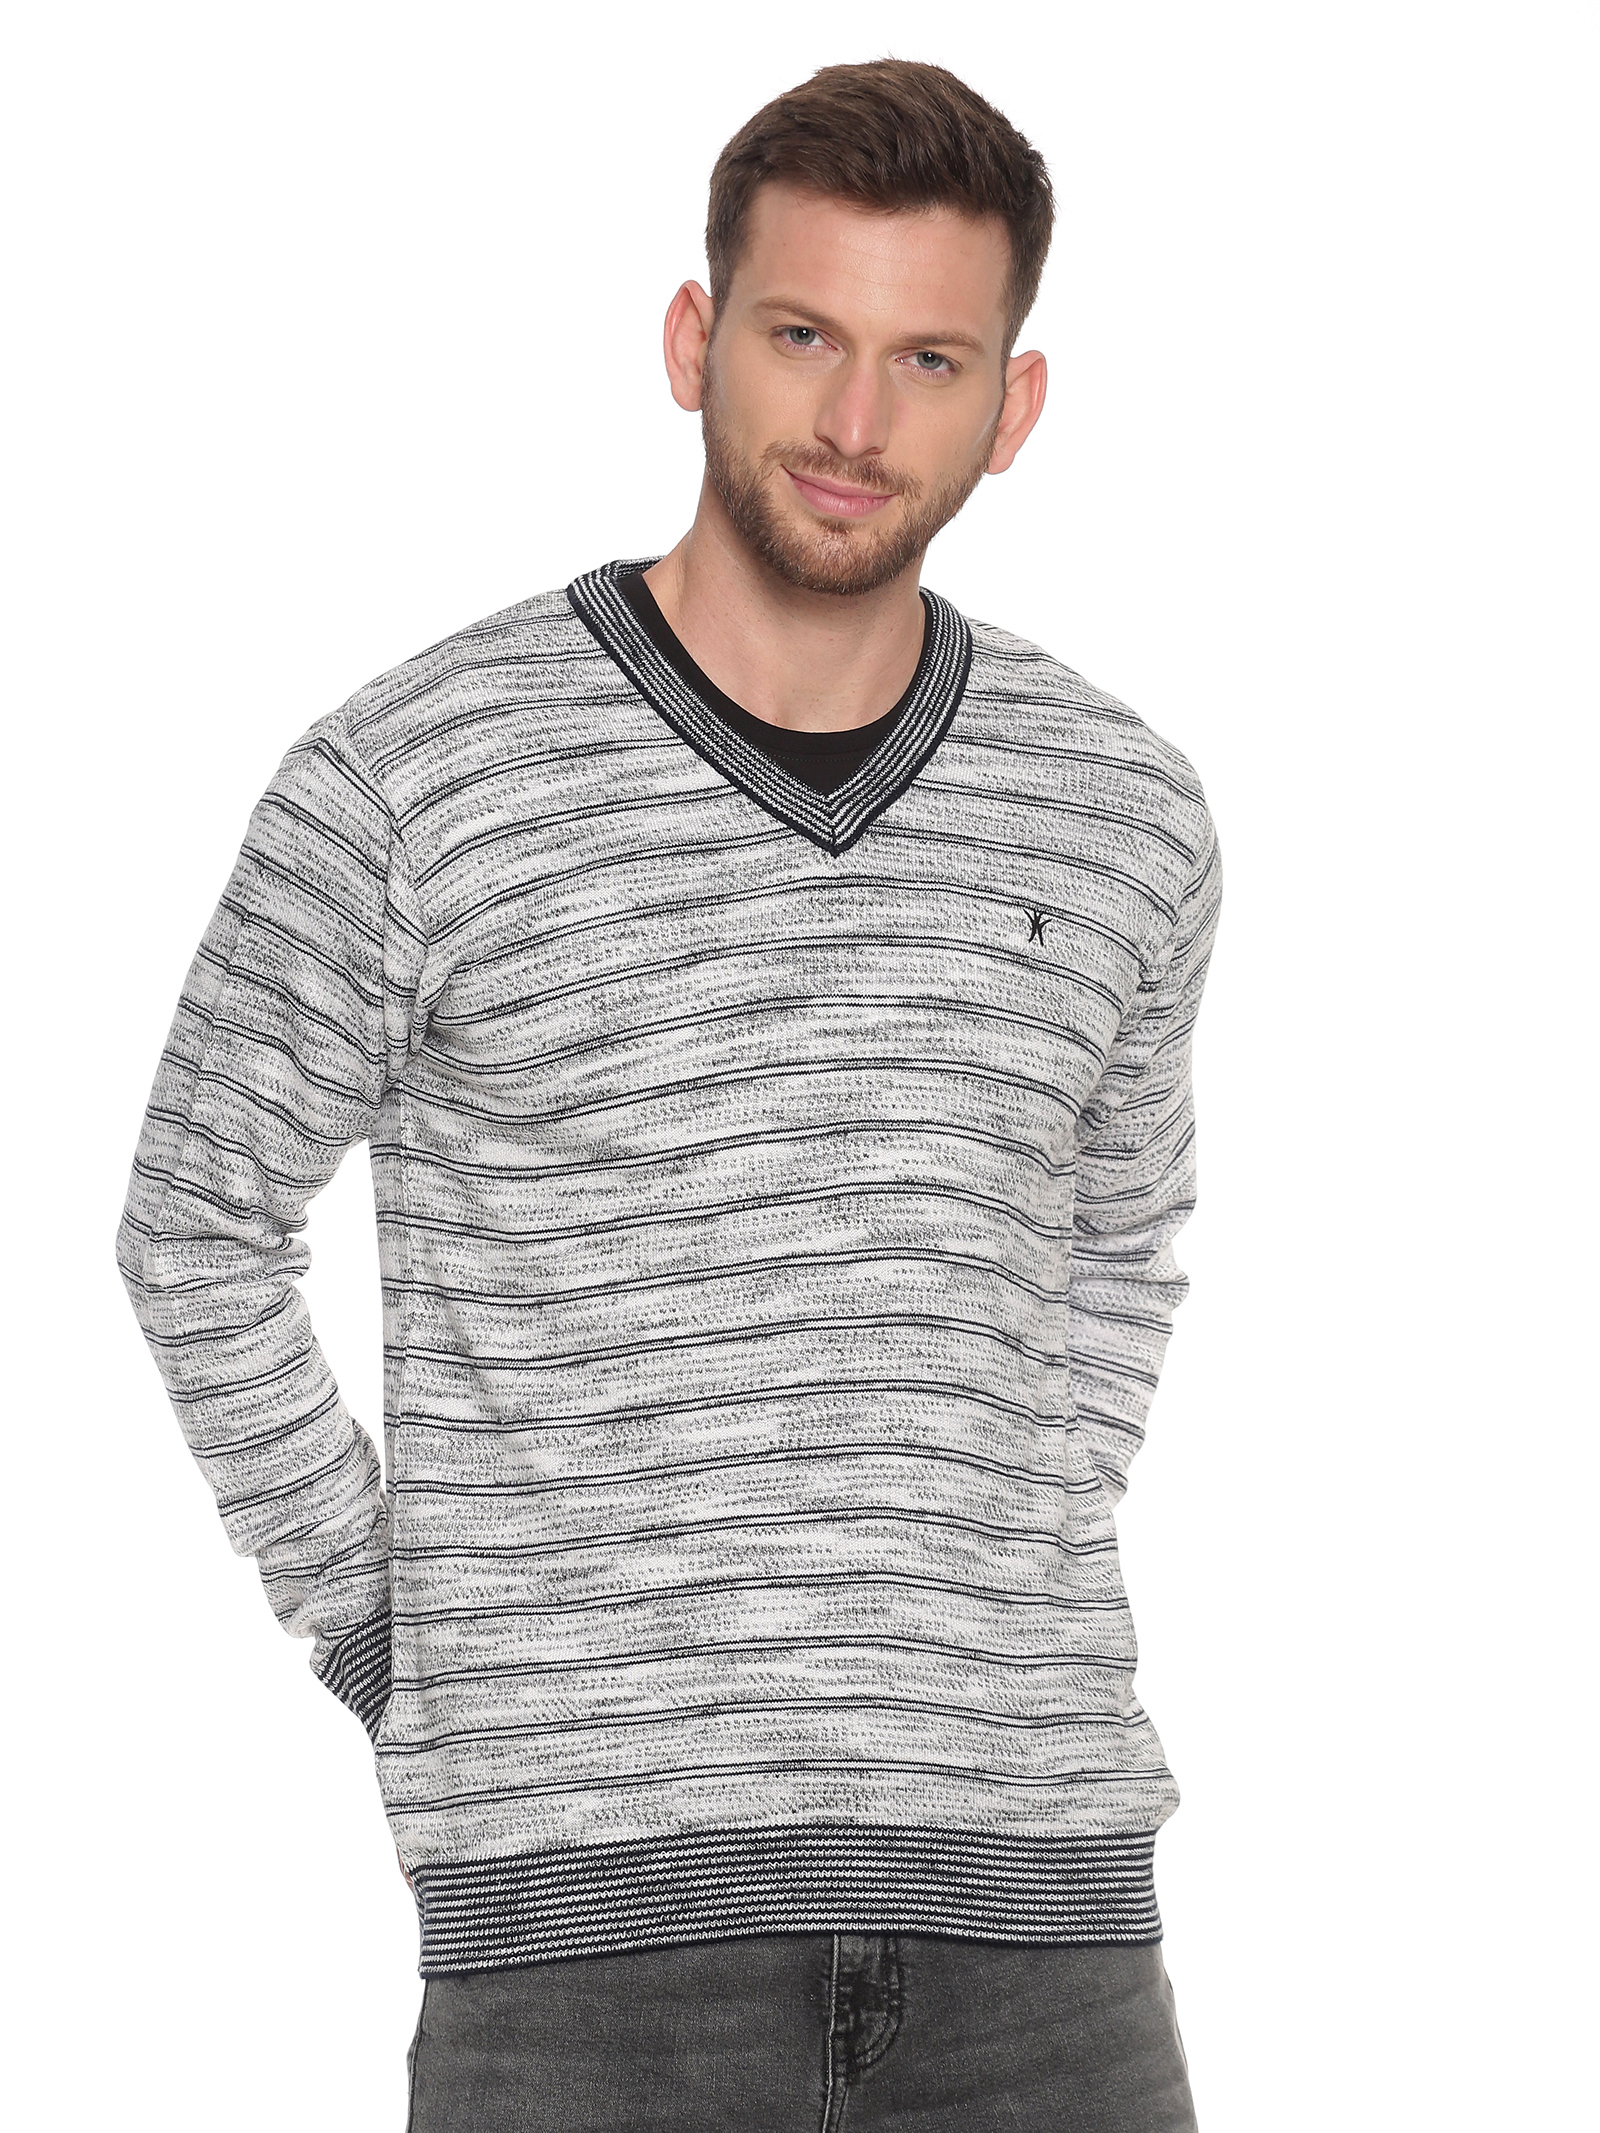 VENITIAN | Venitian Mens Self Design V Neck  Acrylic Blend WIne Sweater